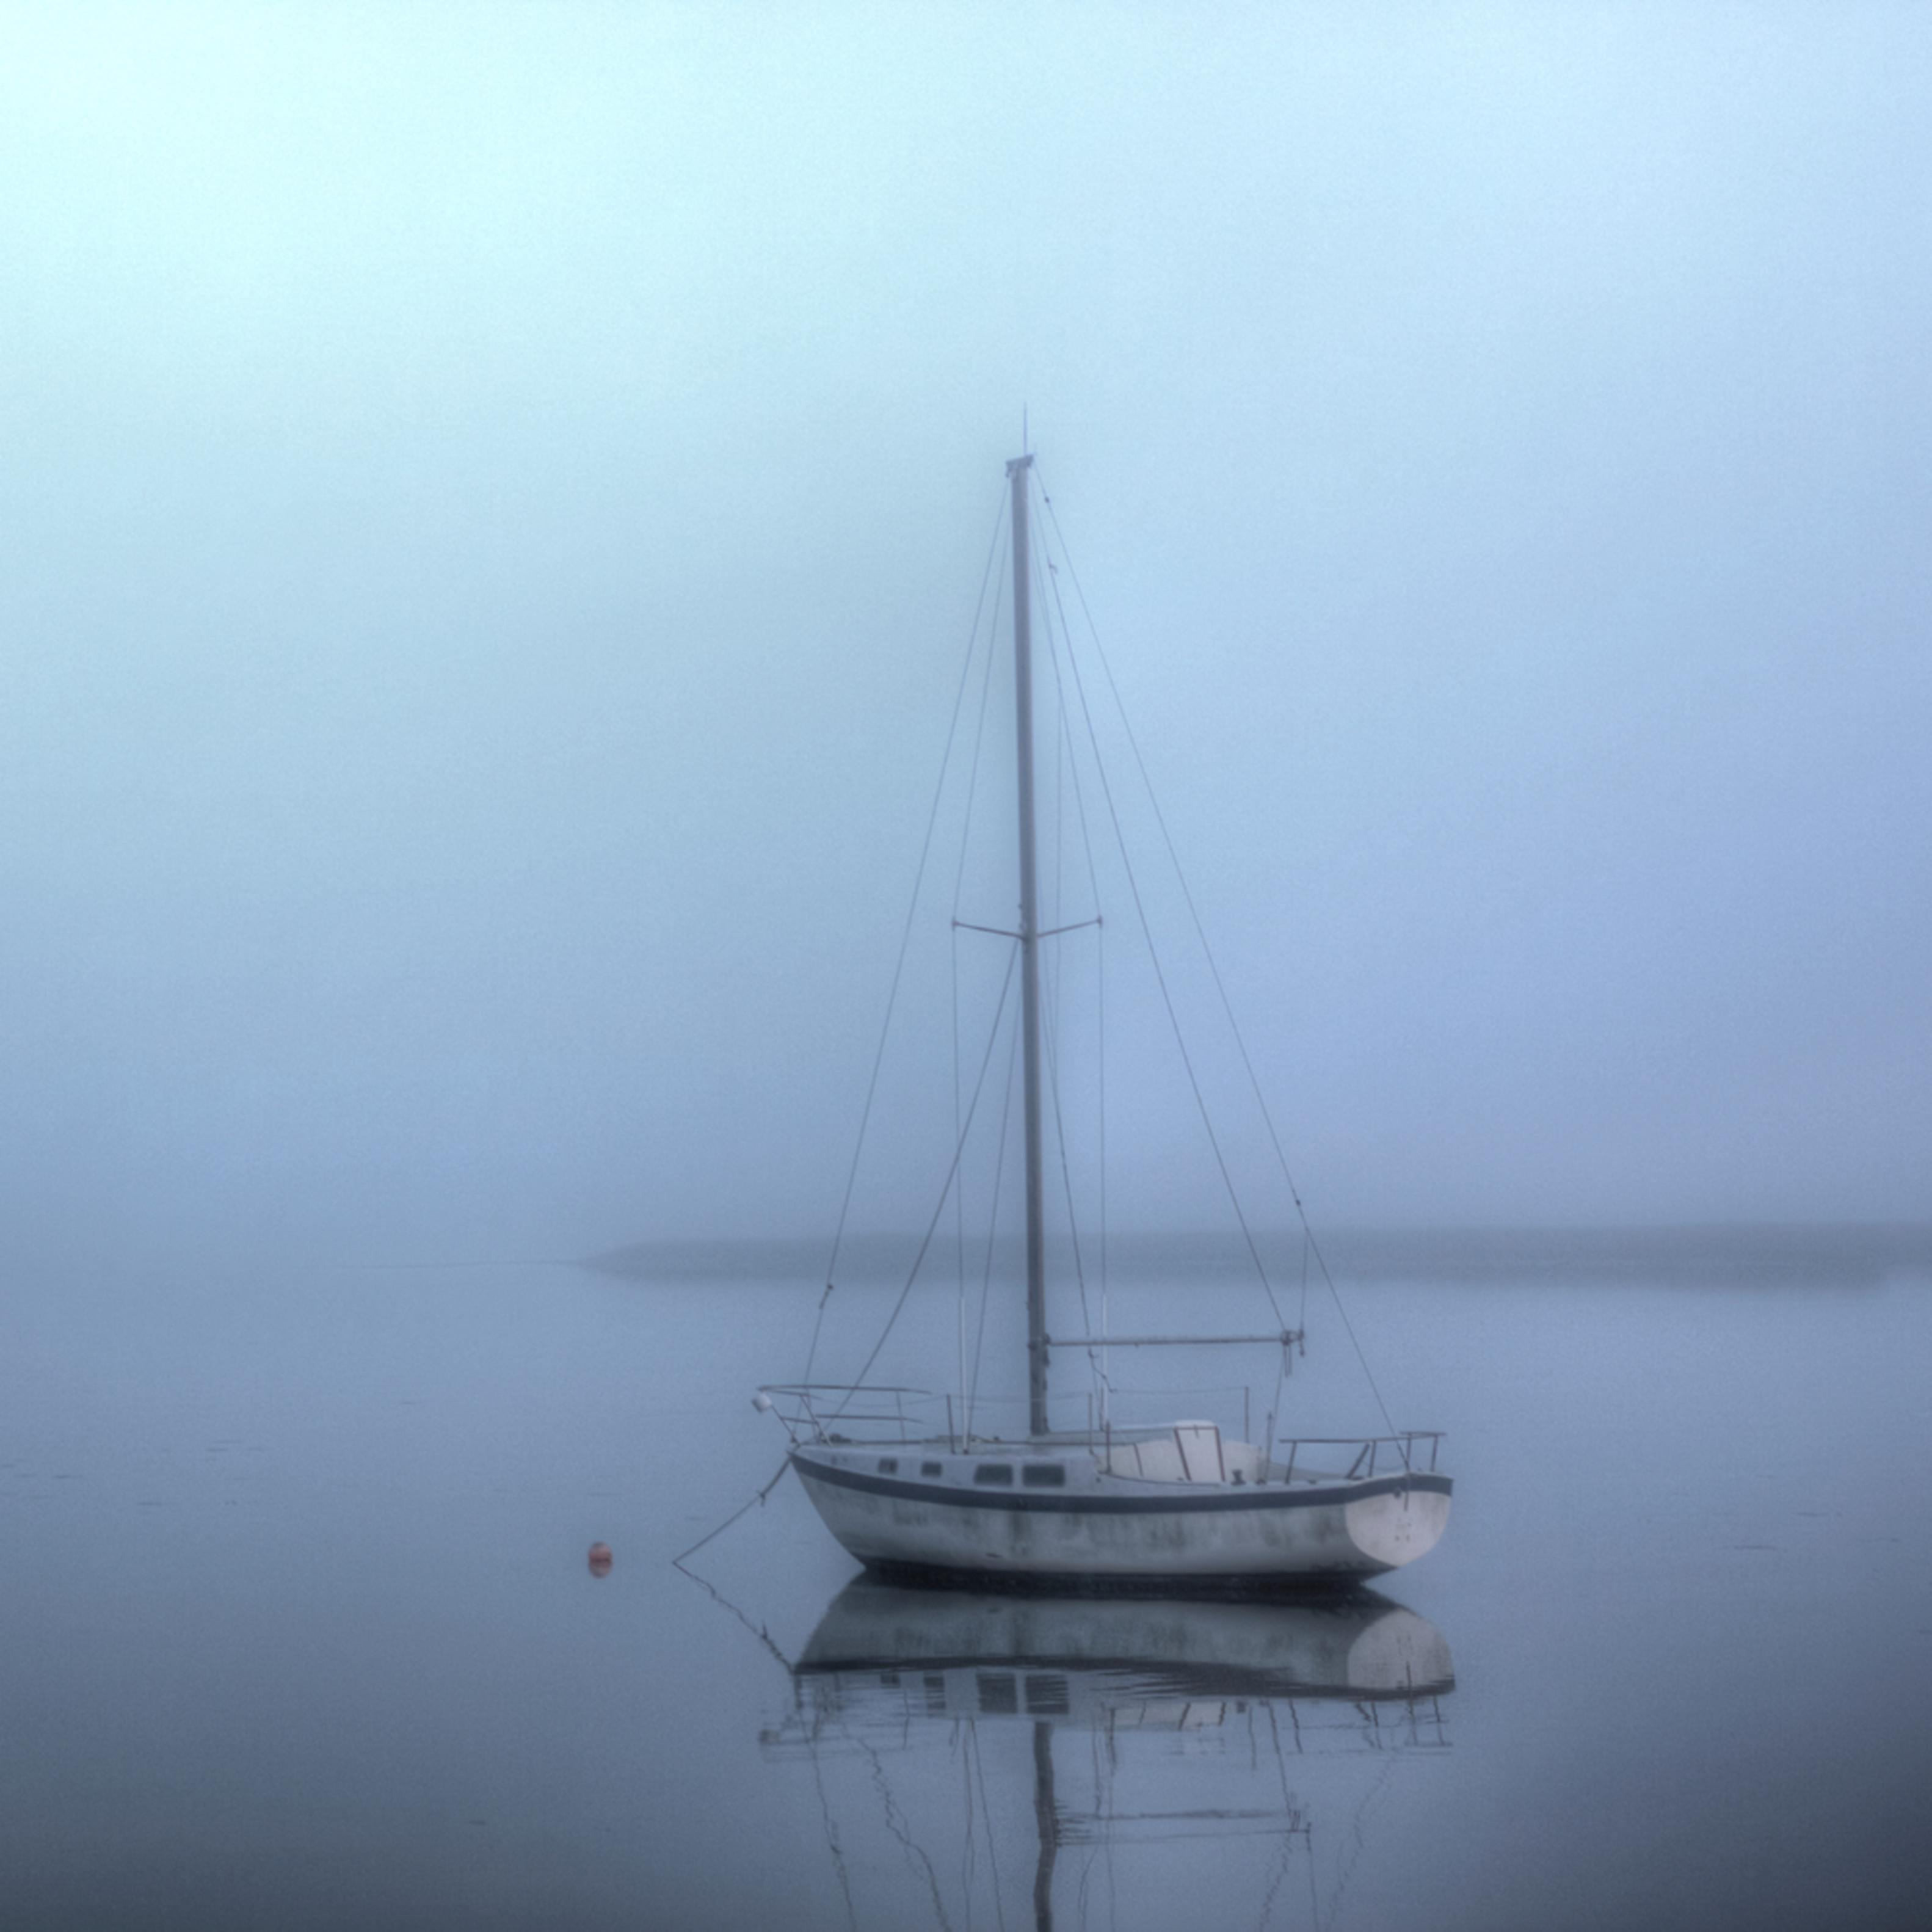 Lone sailboat ac6act